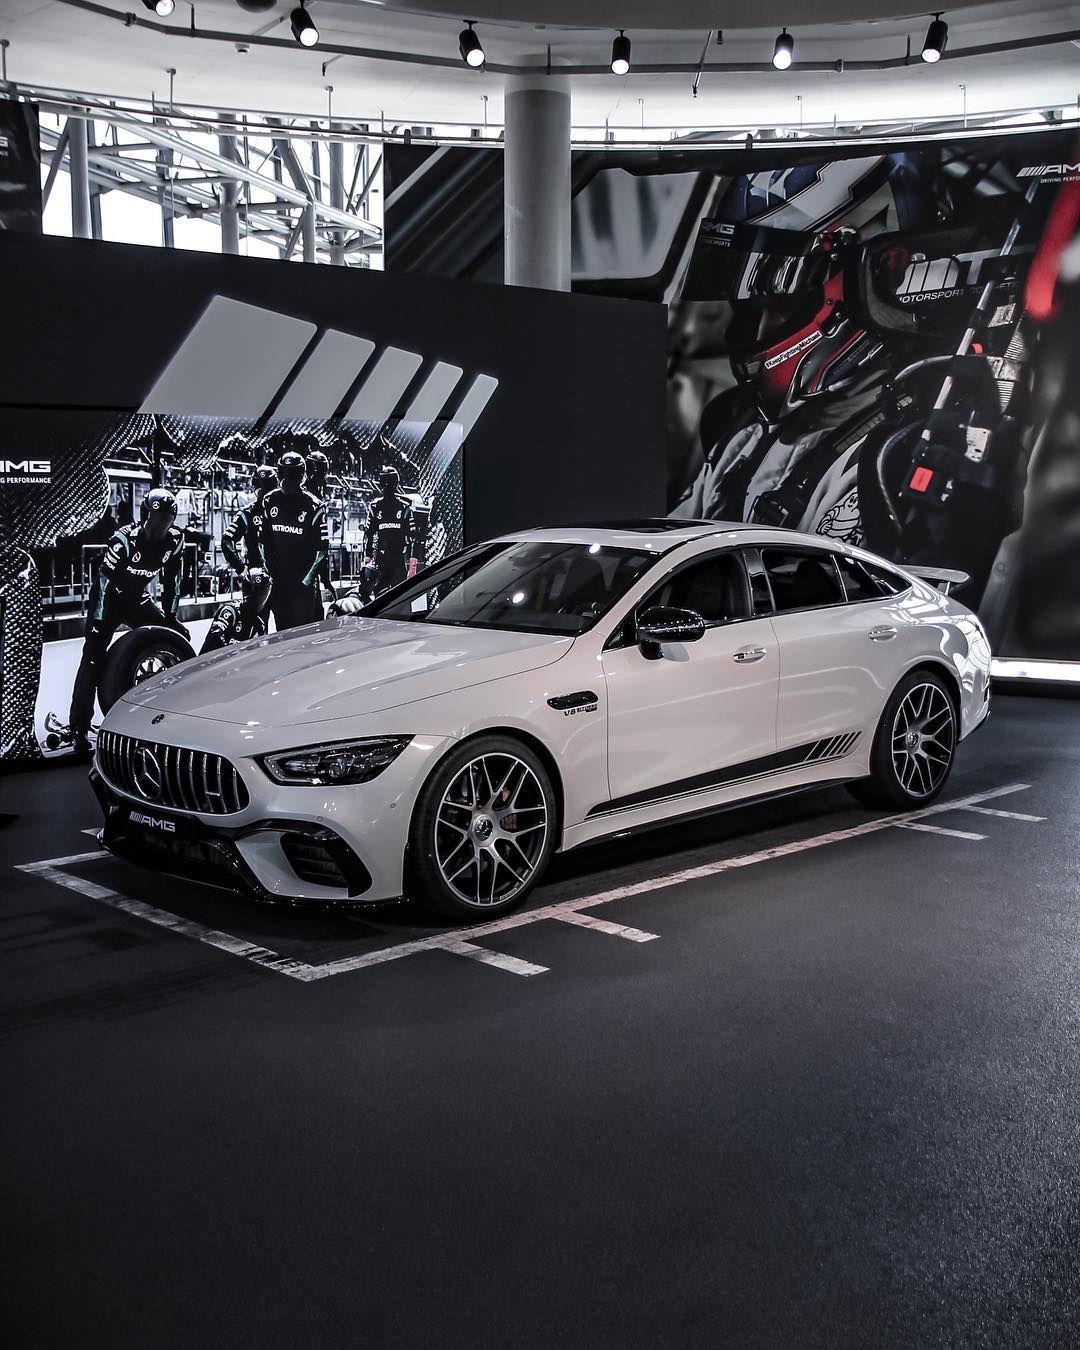 Mercedes Benz Amg, New Luxury Cars